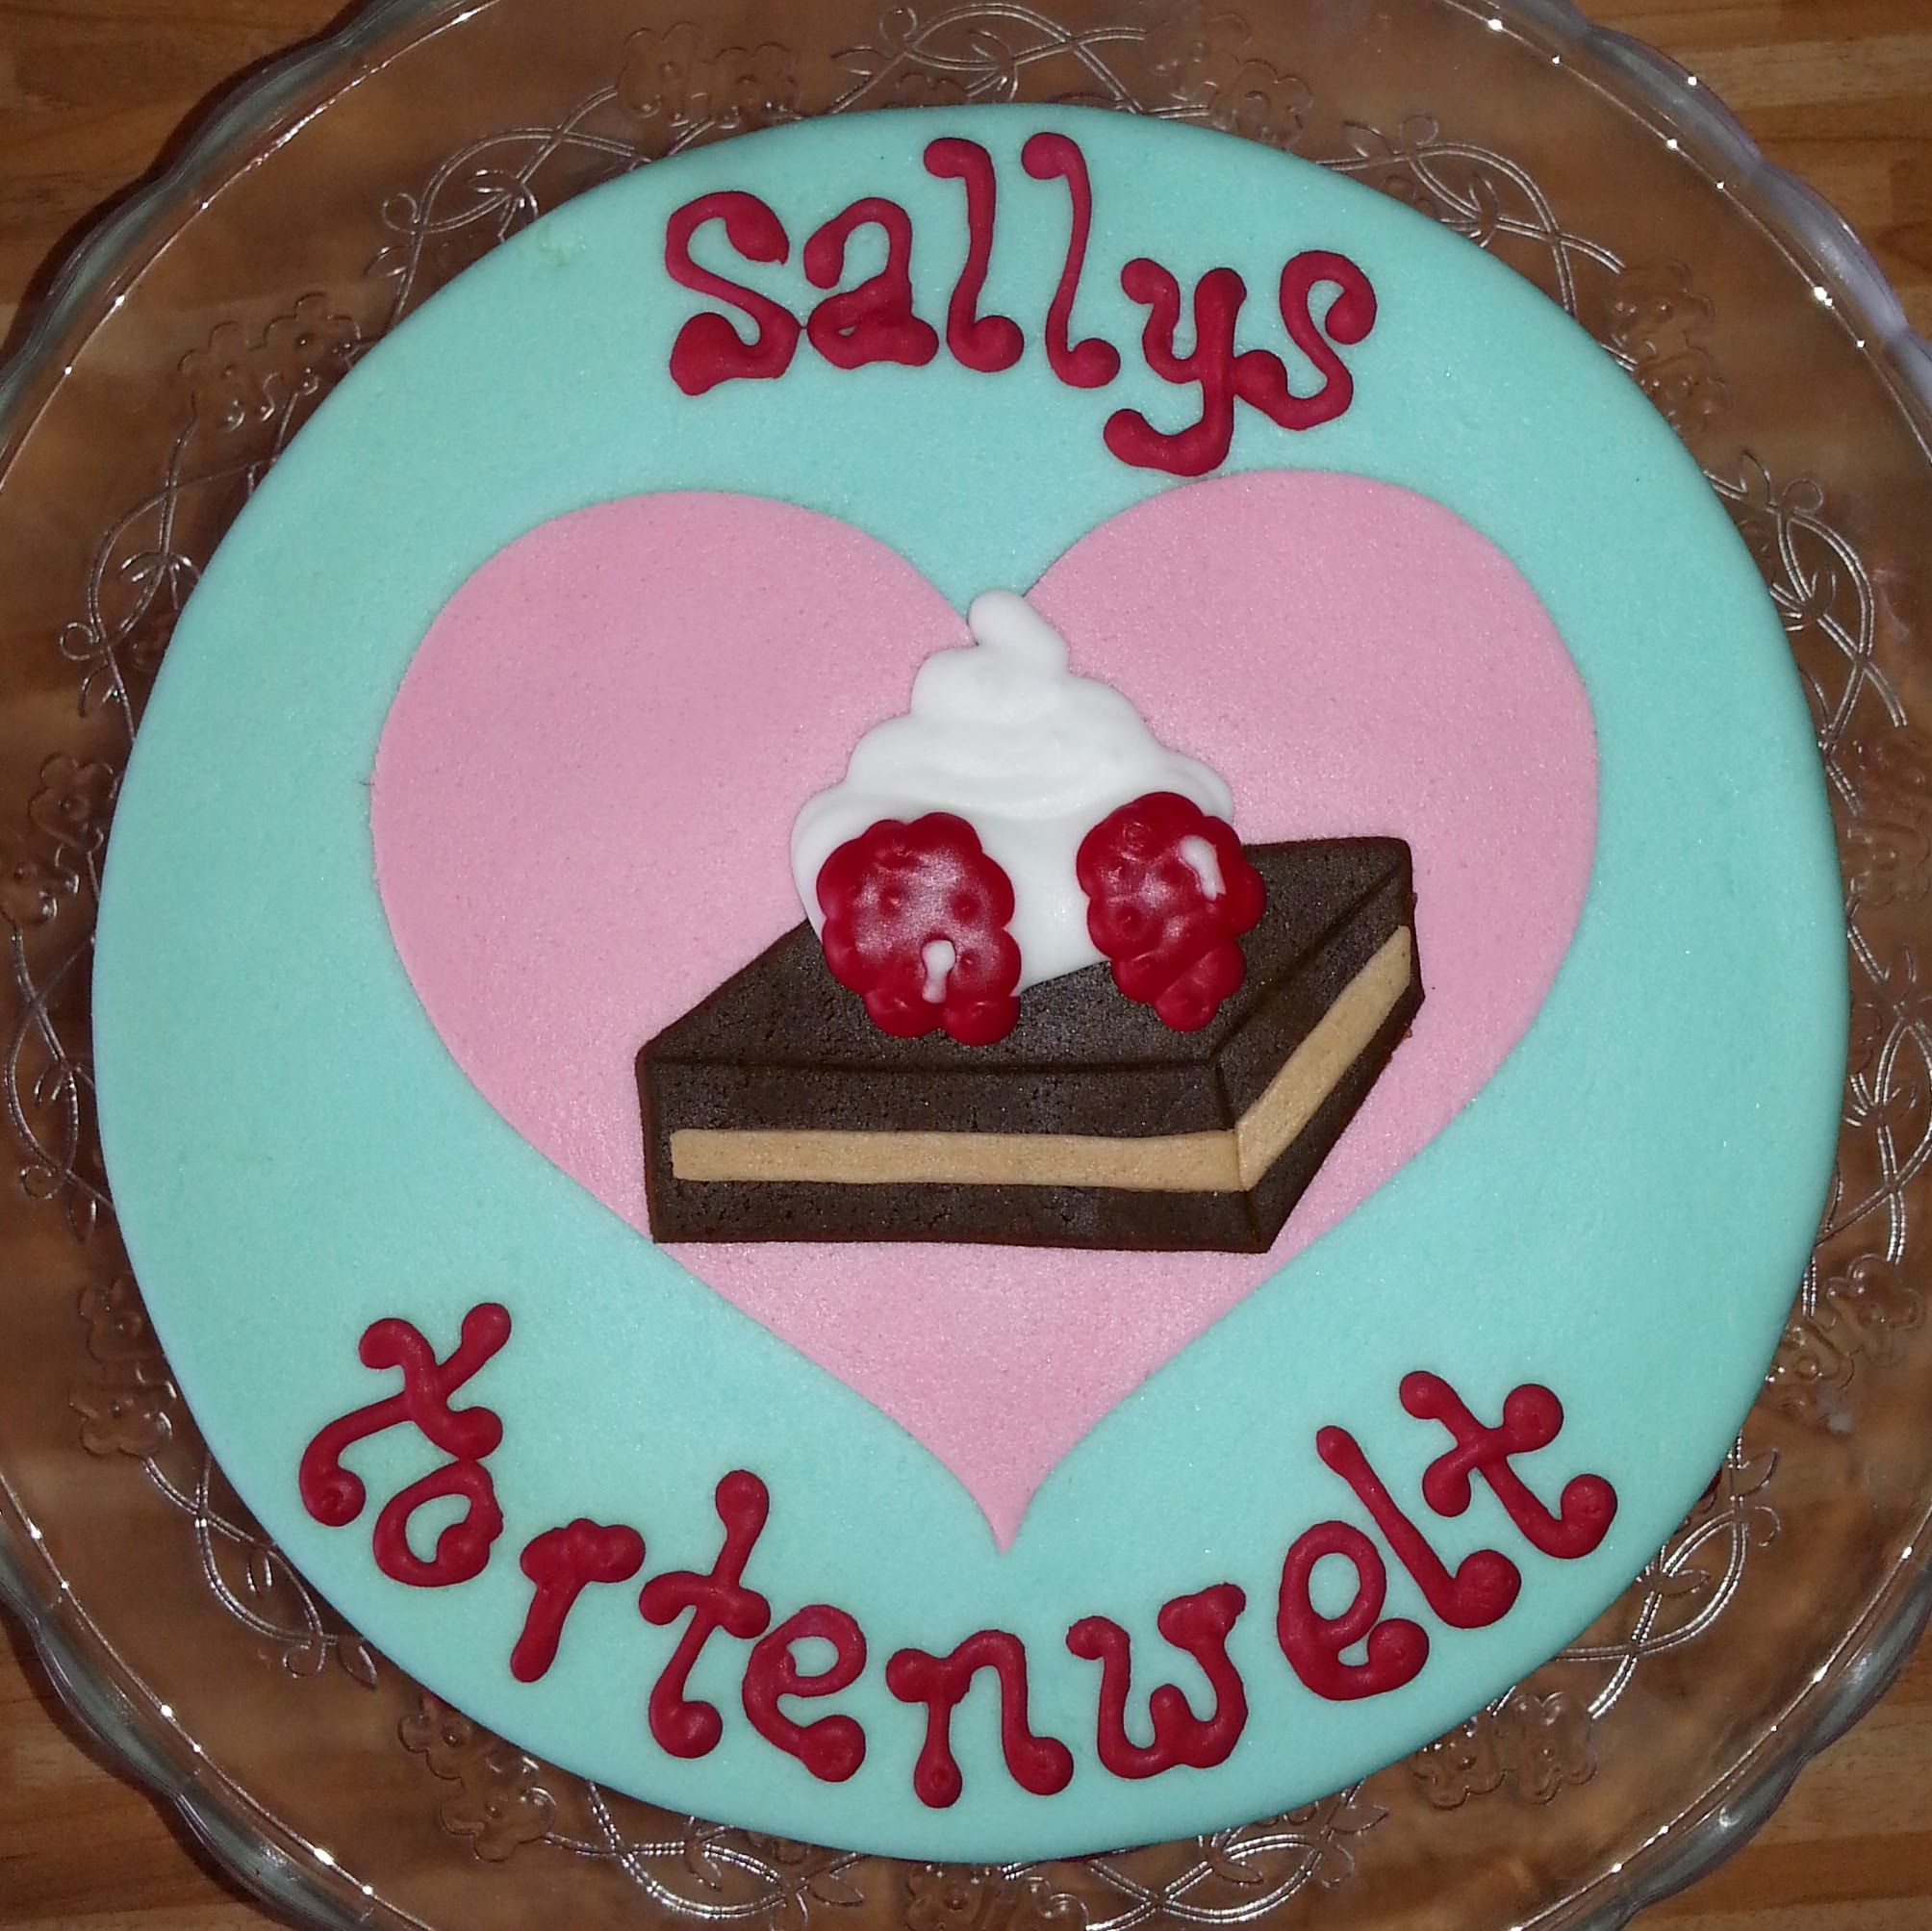 Sallys zitronenkuchen